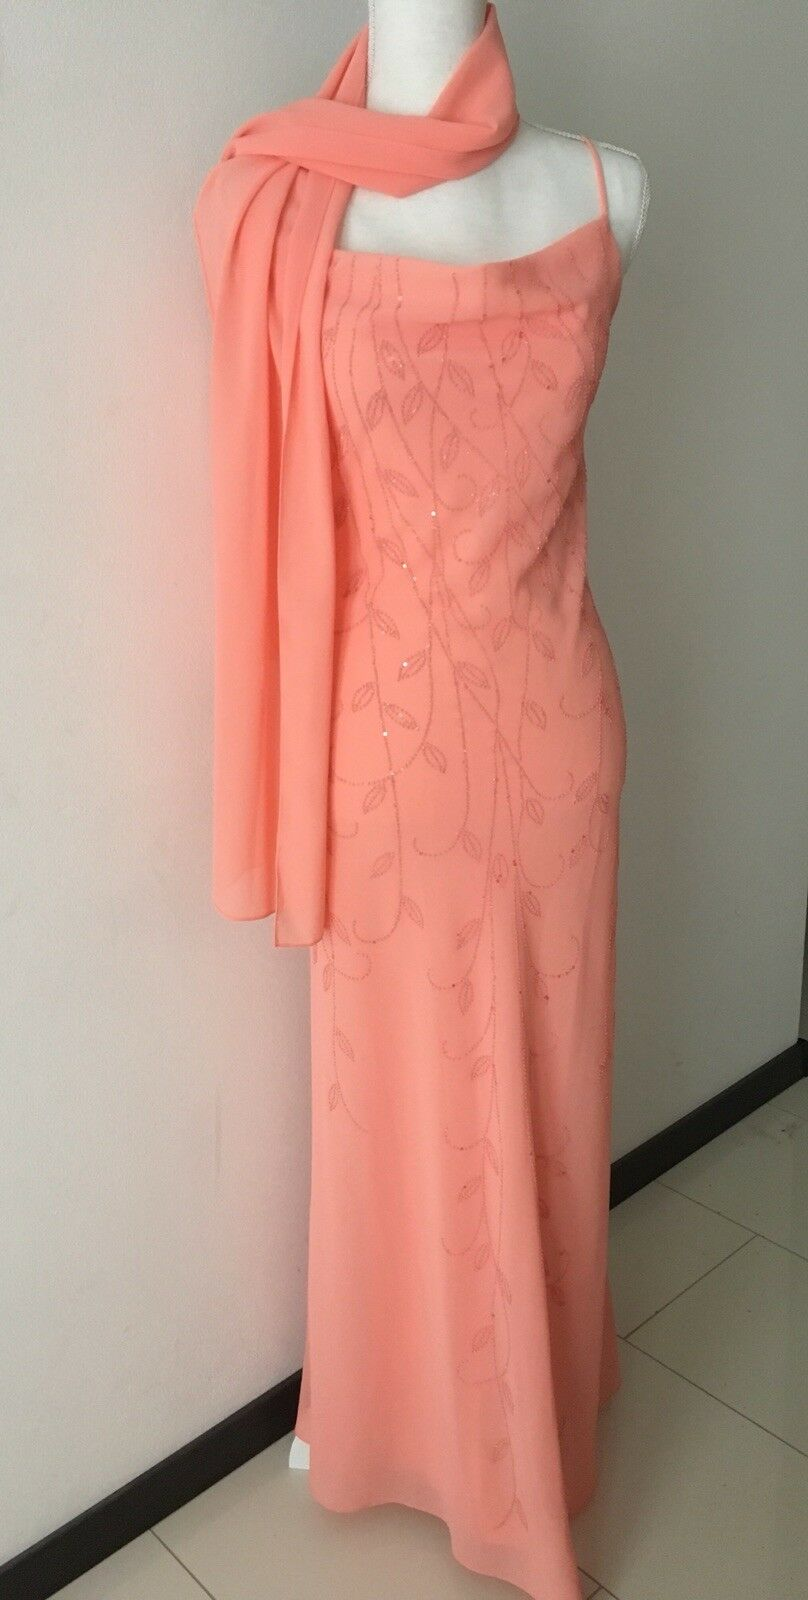 Unique Pailettenkleid Abendkleid XS Neuwertig